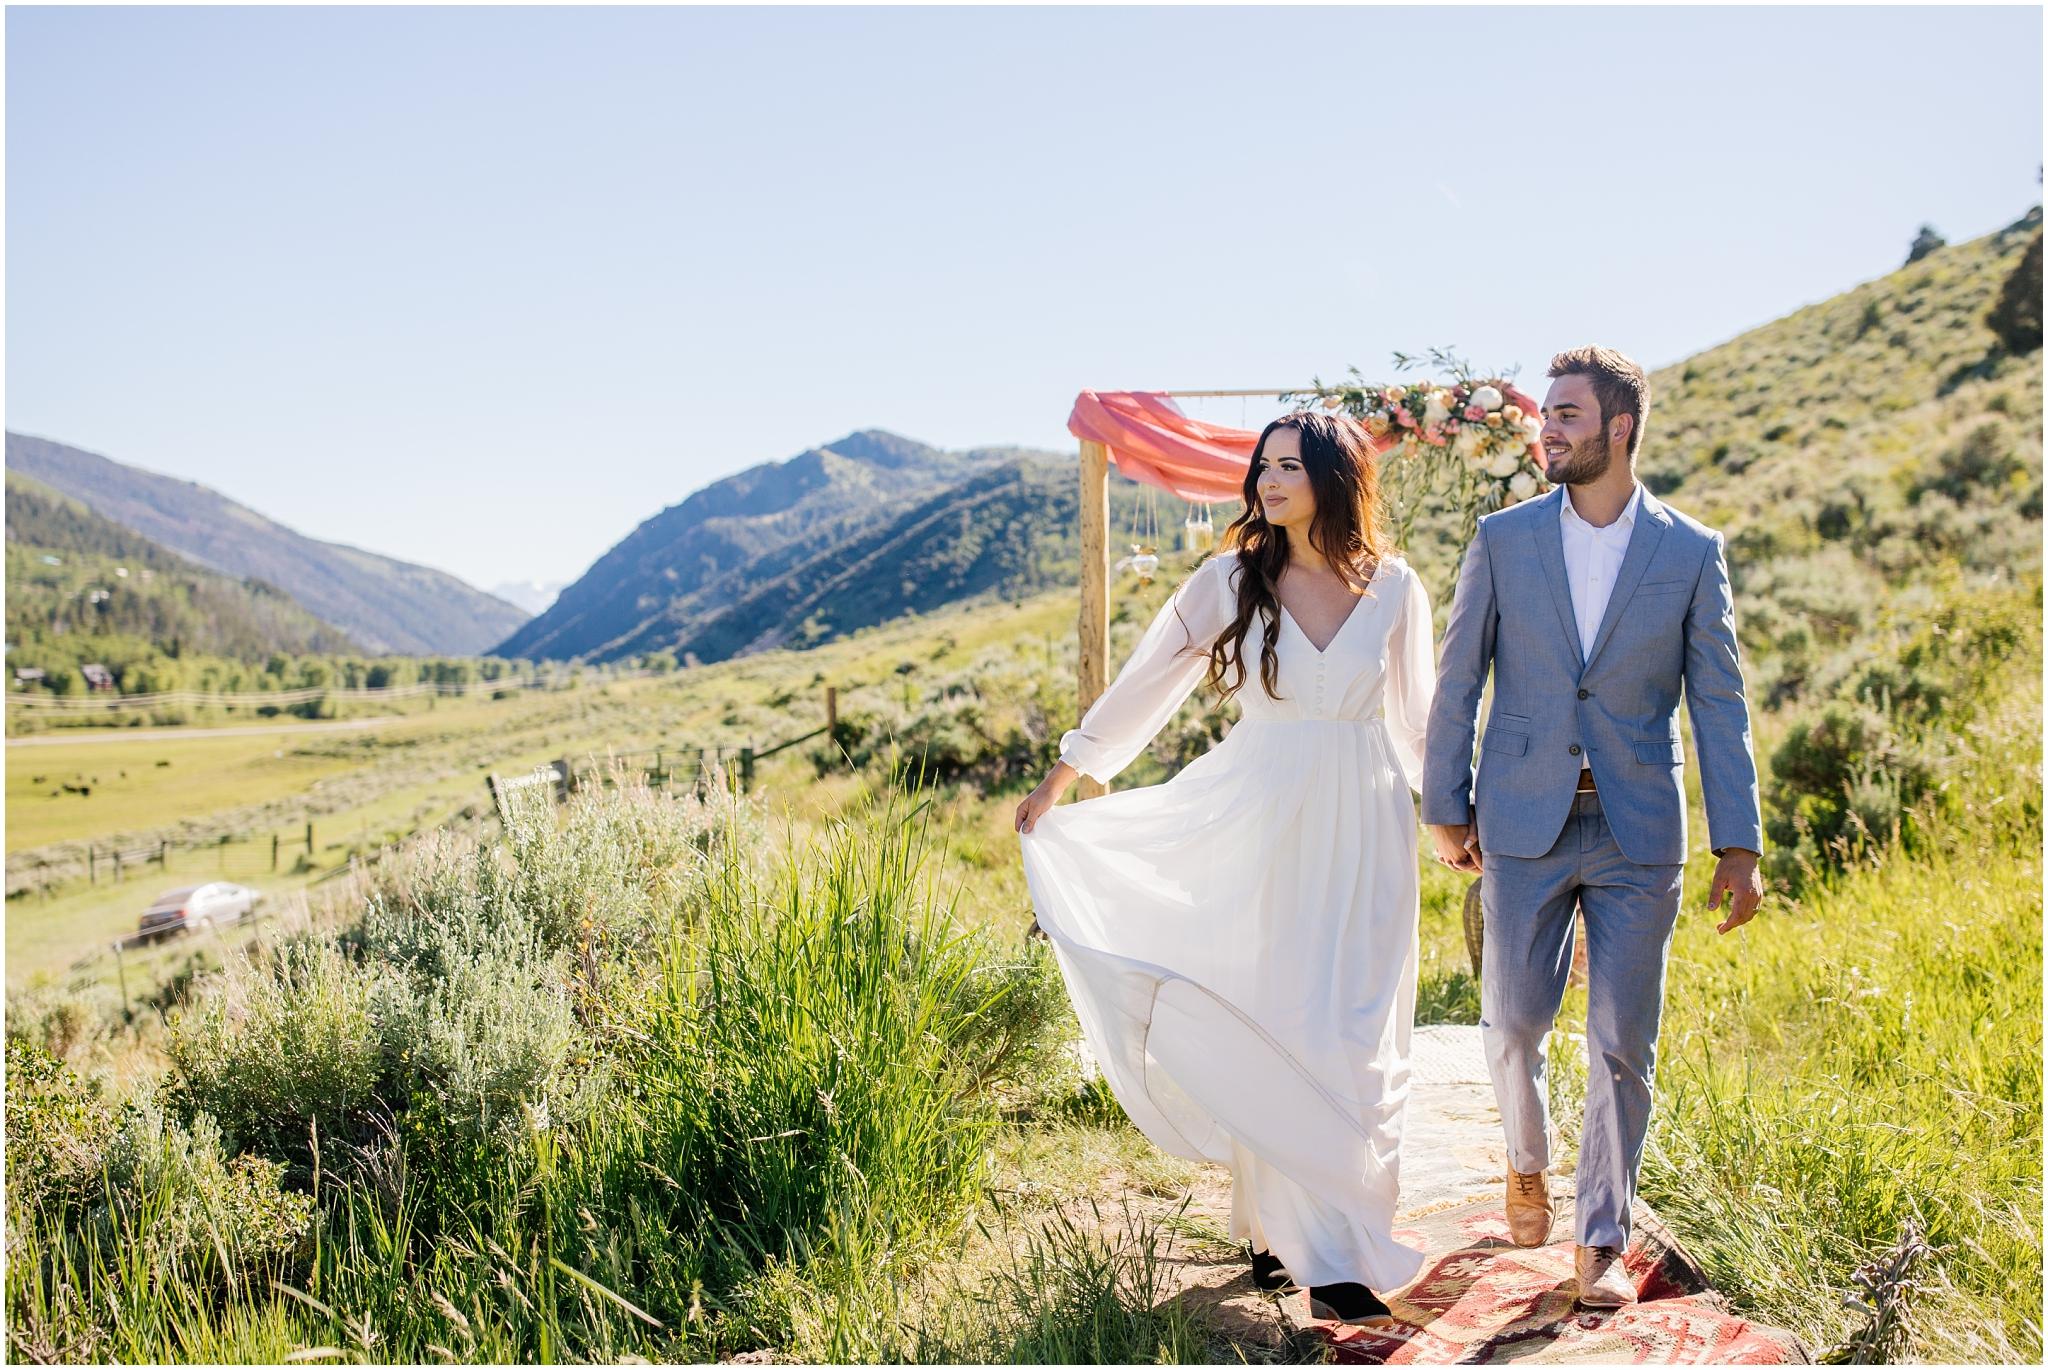 MountainShoot-52_Lizzie-B-Imagery-Utah-Wedding-Photographer-Salt-Lake-City-Park-City-Utah-County.jpg